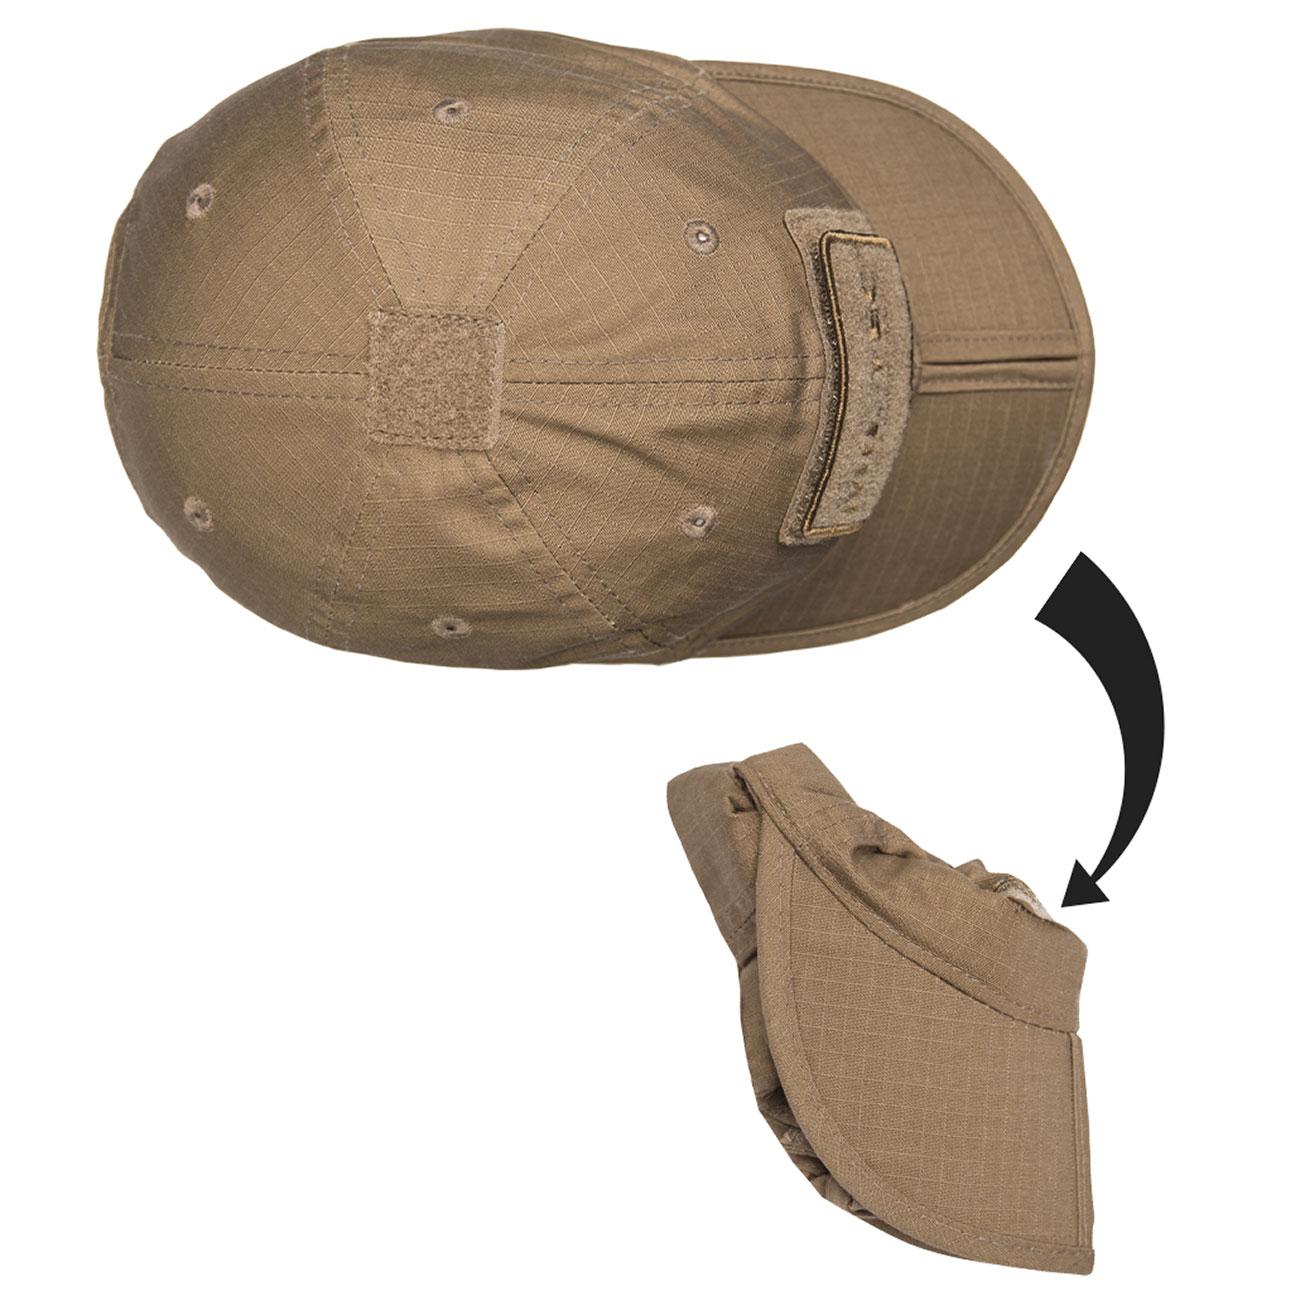 04a89cf809f64 Mil-Tec Baseball Cap faltbar dark coyote günstig kaufen - Kotte   Zeller